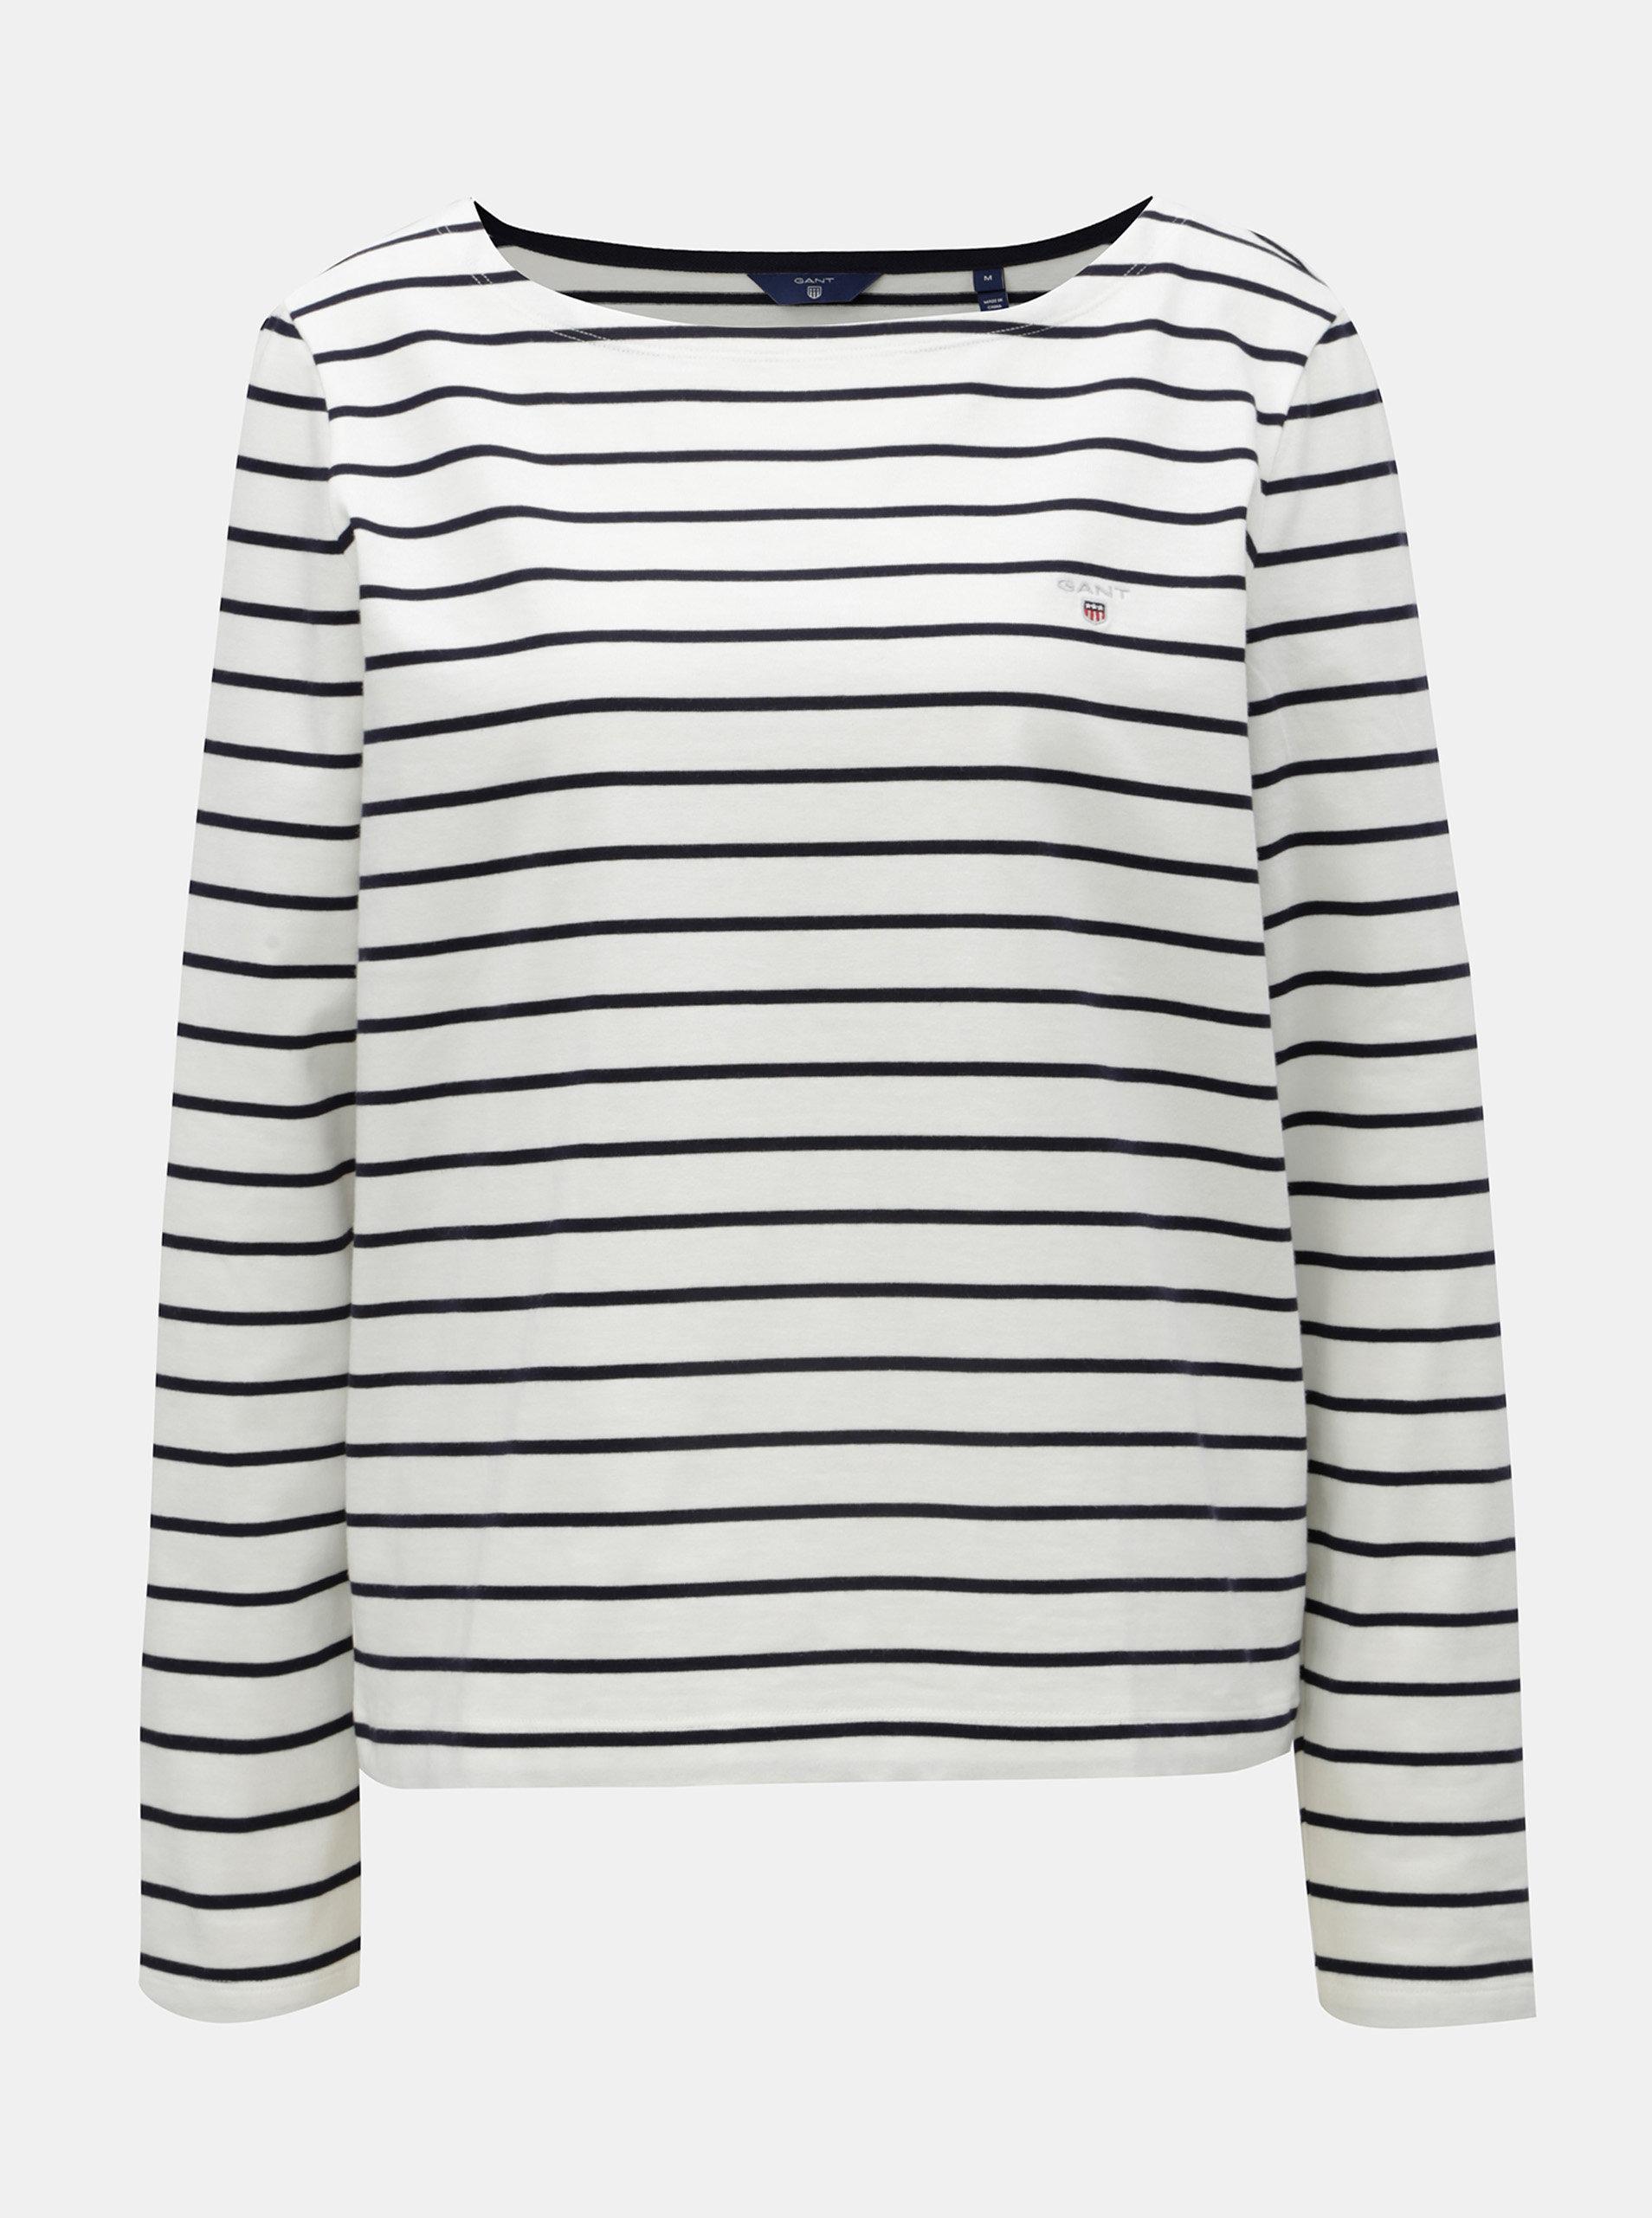 be3cc5d87 Modro-biele dámske pruhované basic tričko s dlhým rukávom GANT | ZOOT.sk